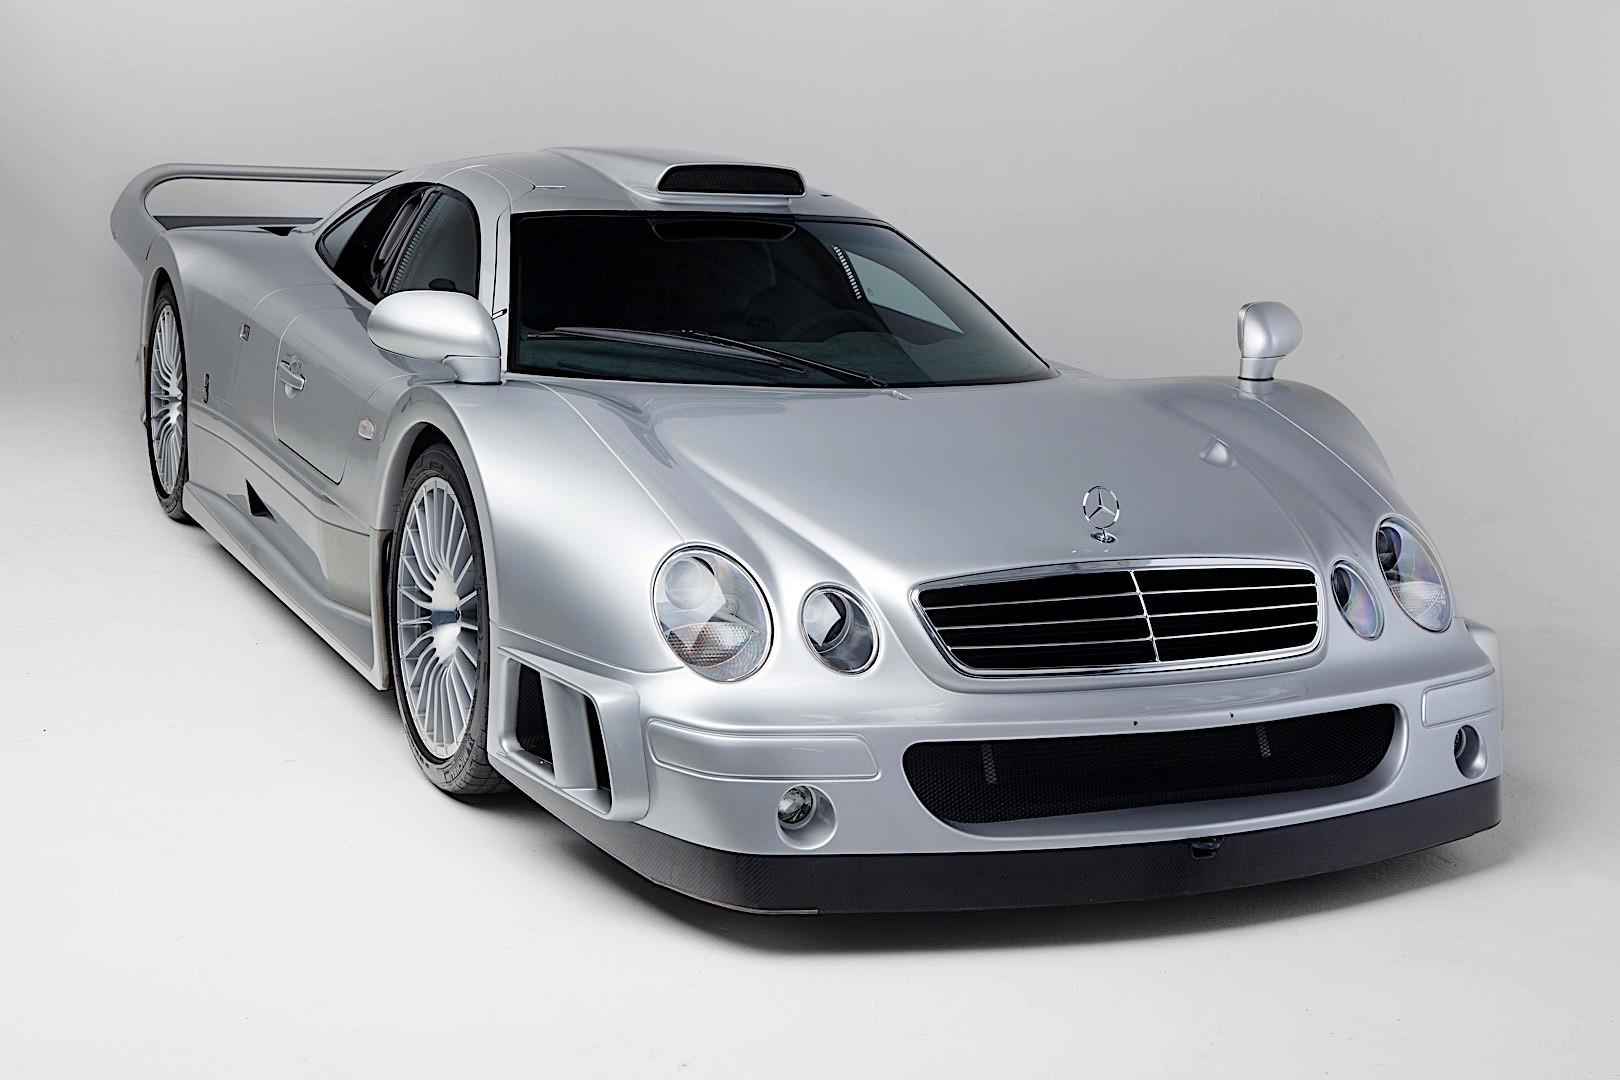 Mercedes Benz Clk Gtr Amg Specs 1998 1999 Autoevolution